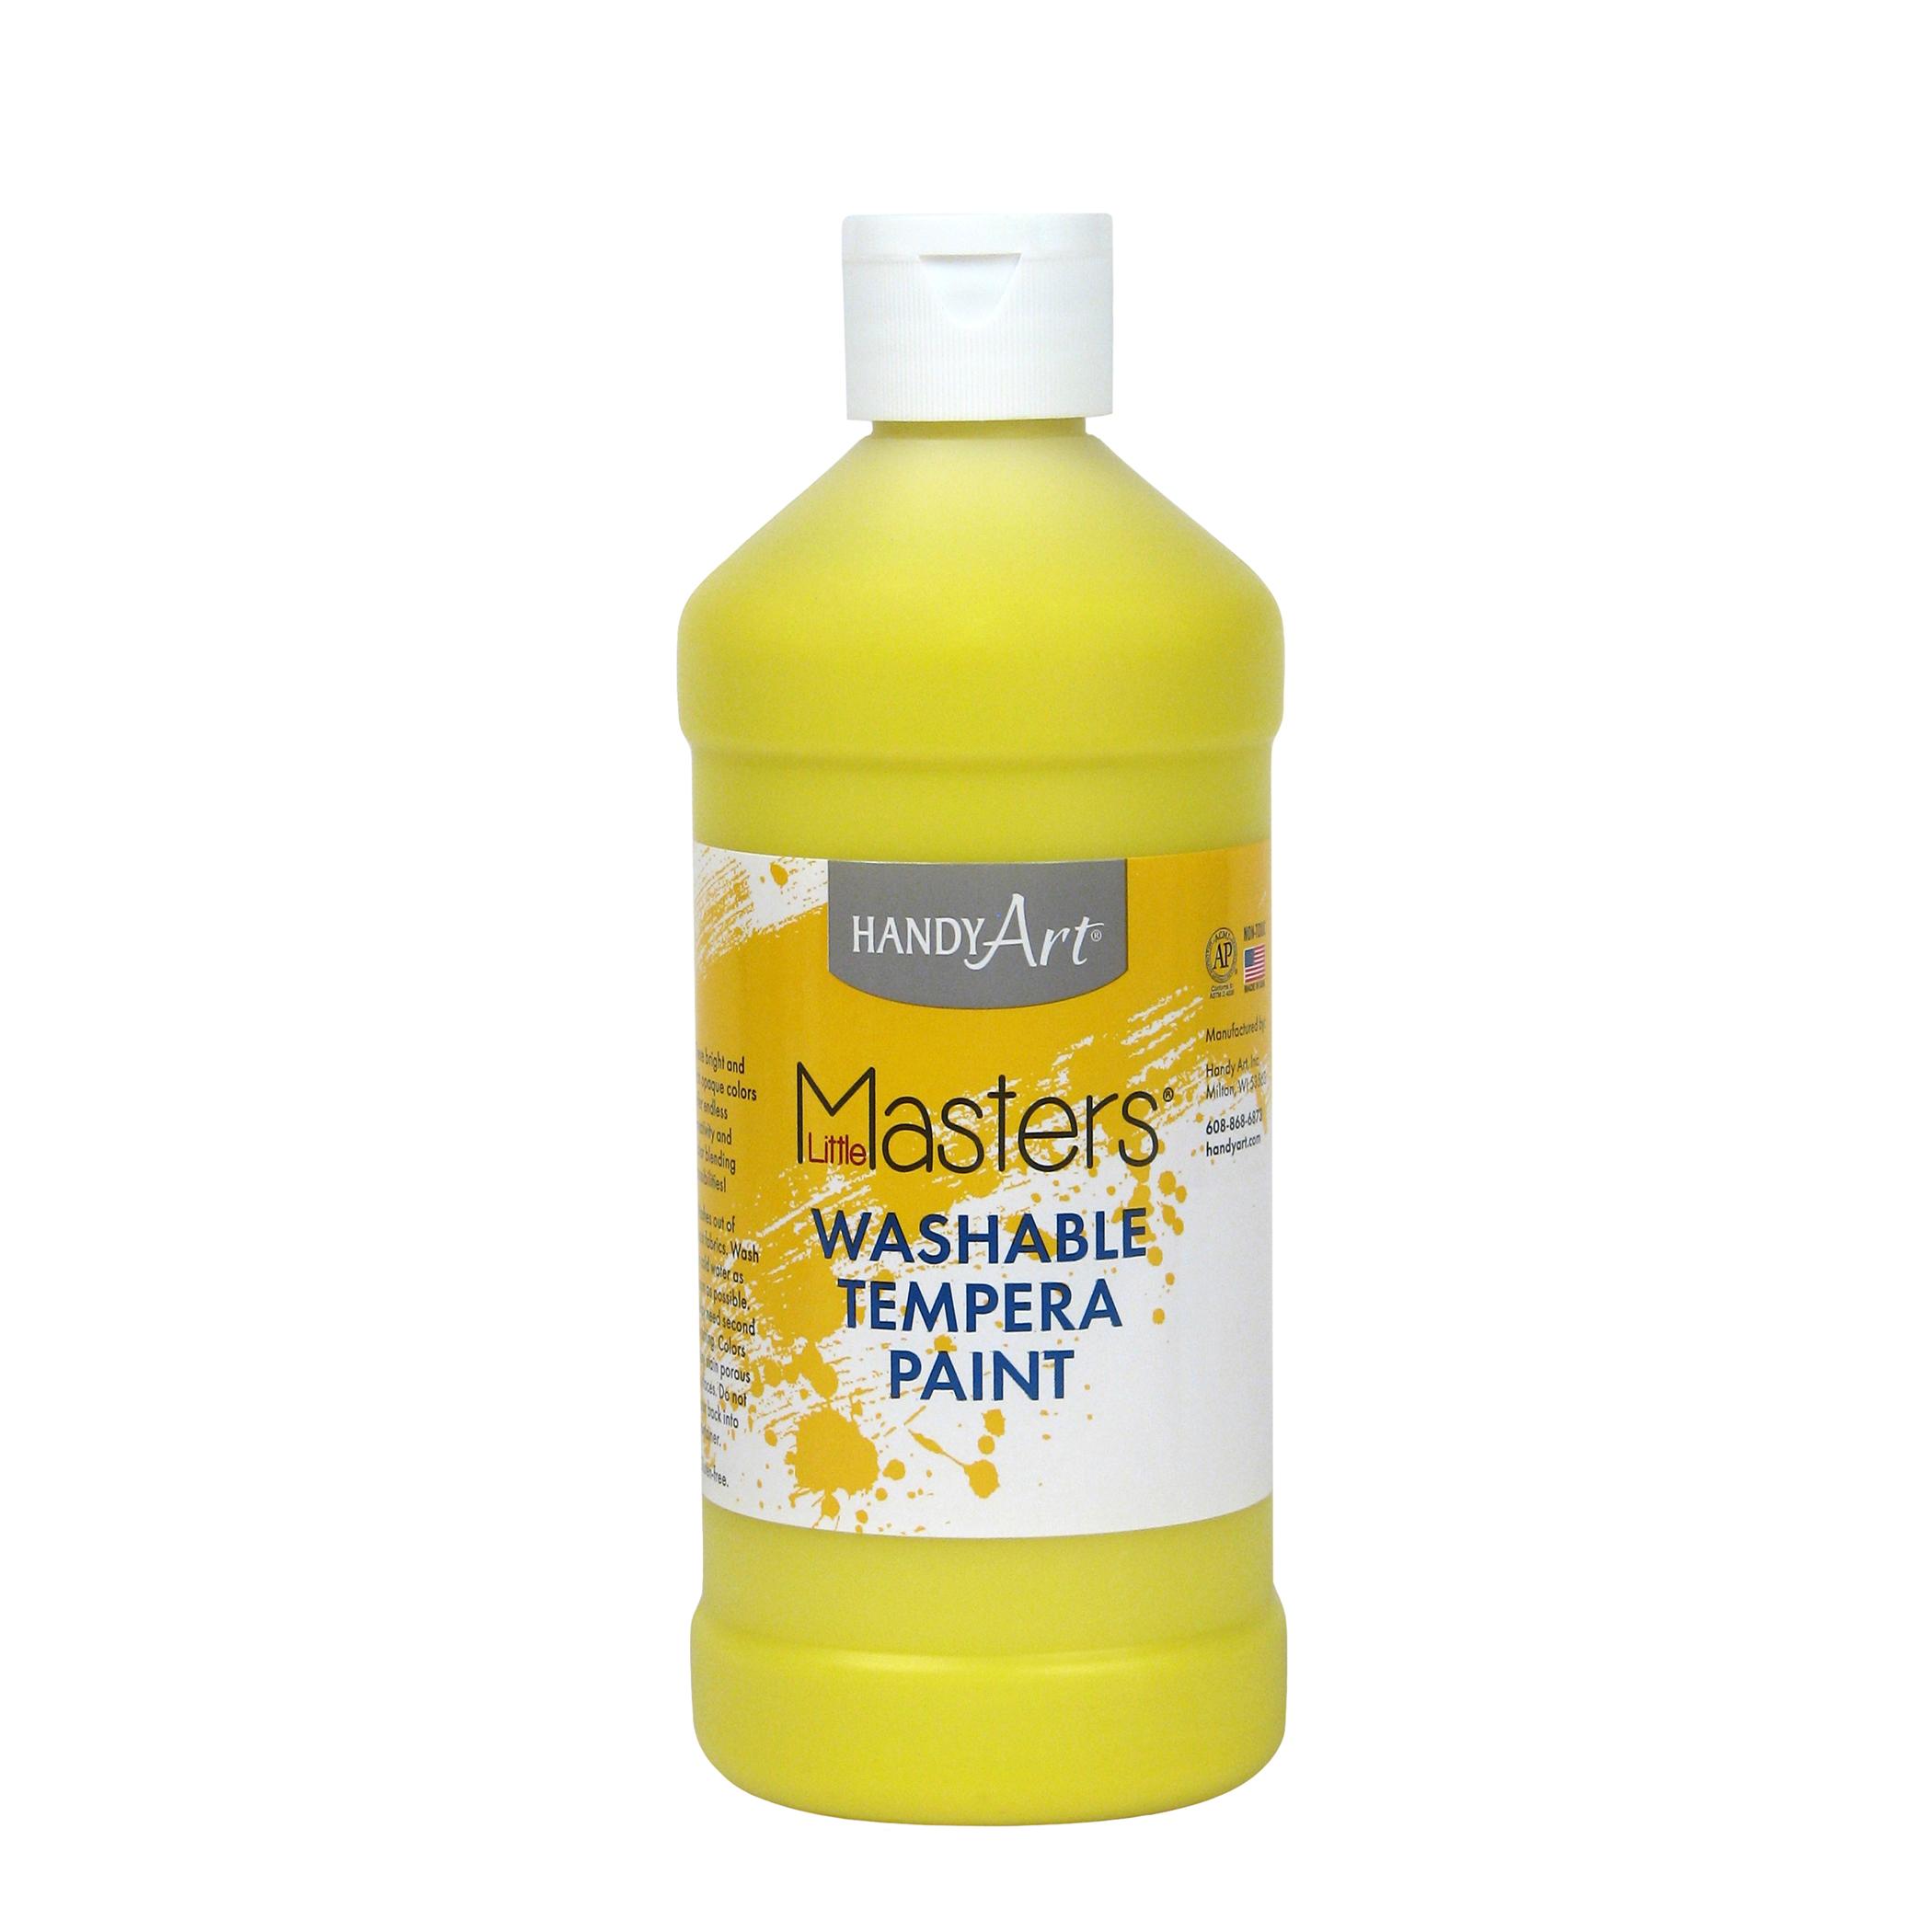 Little Masters™ Washable Paint, Yellow, 16 oz., Set of 12 bottles